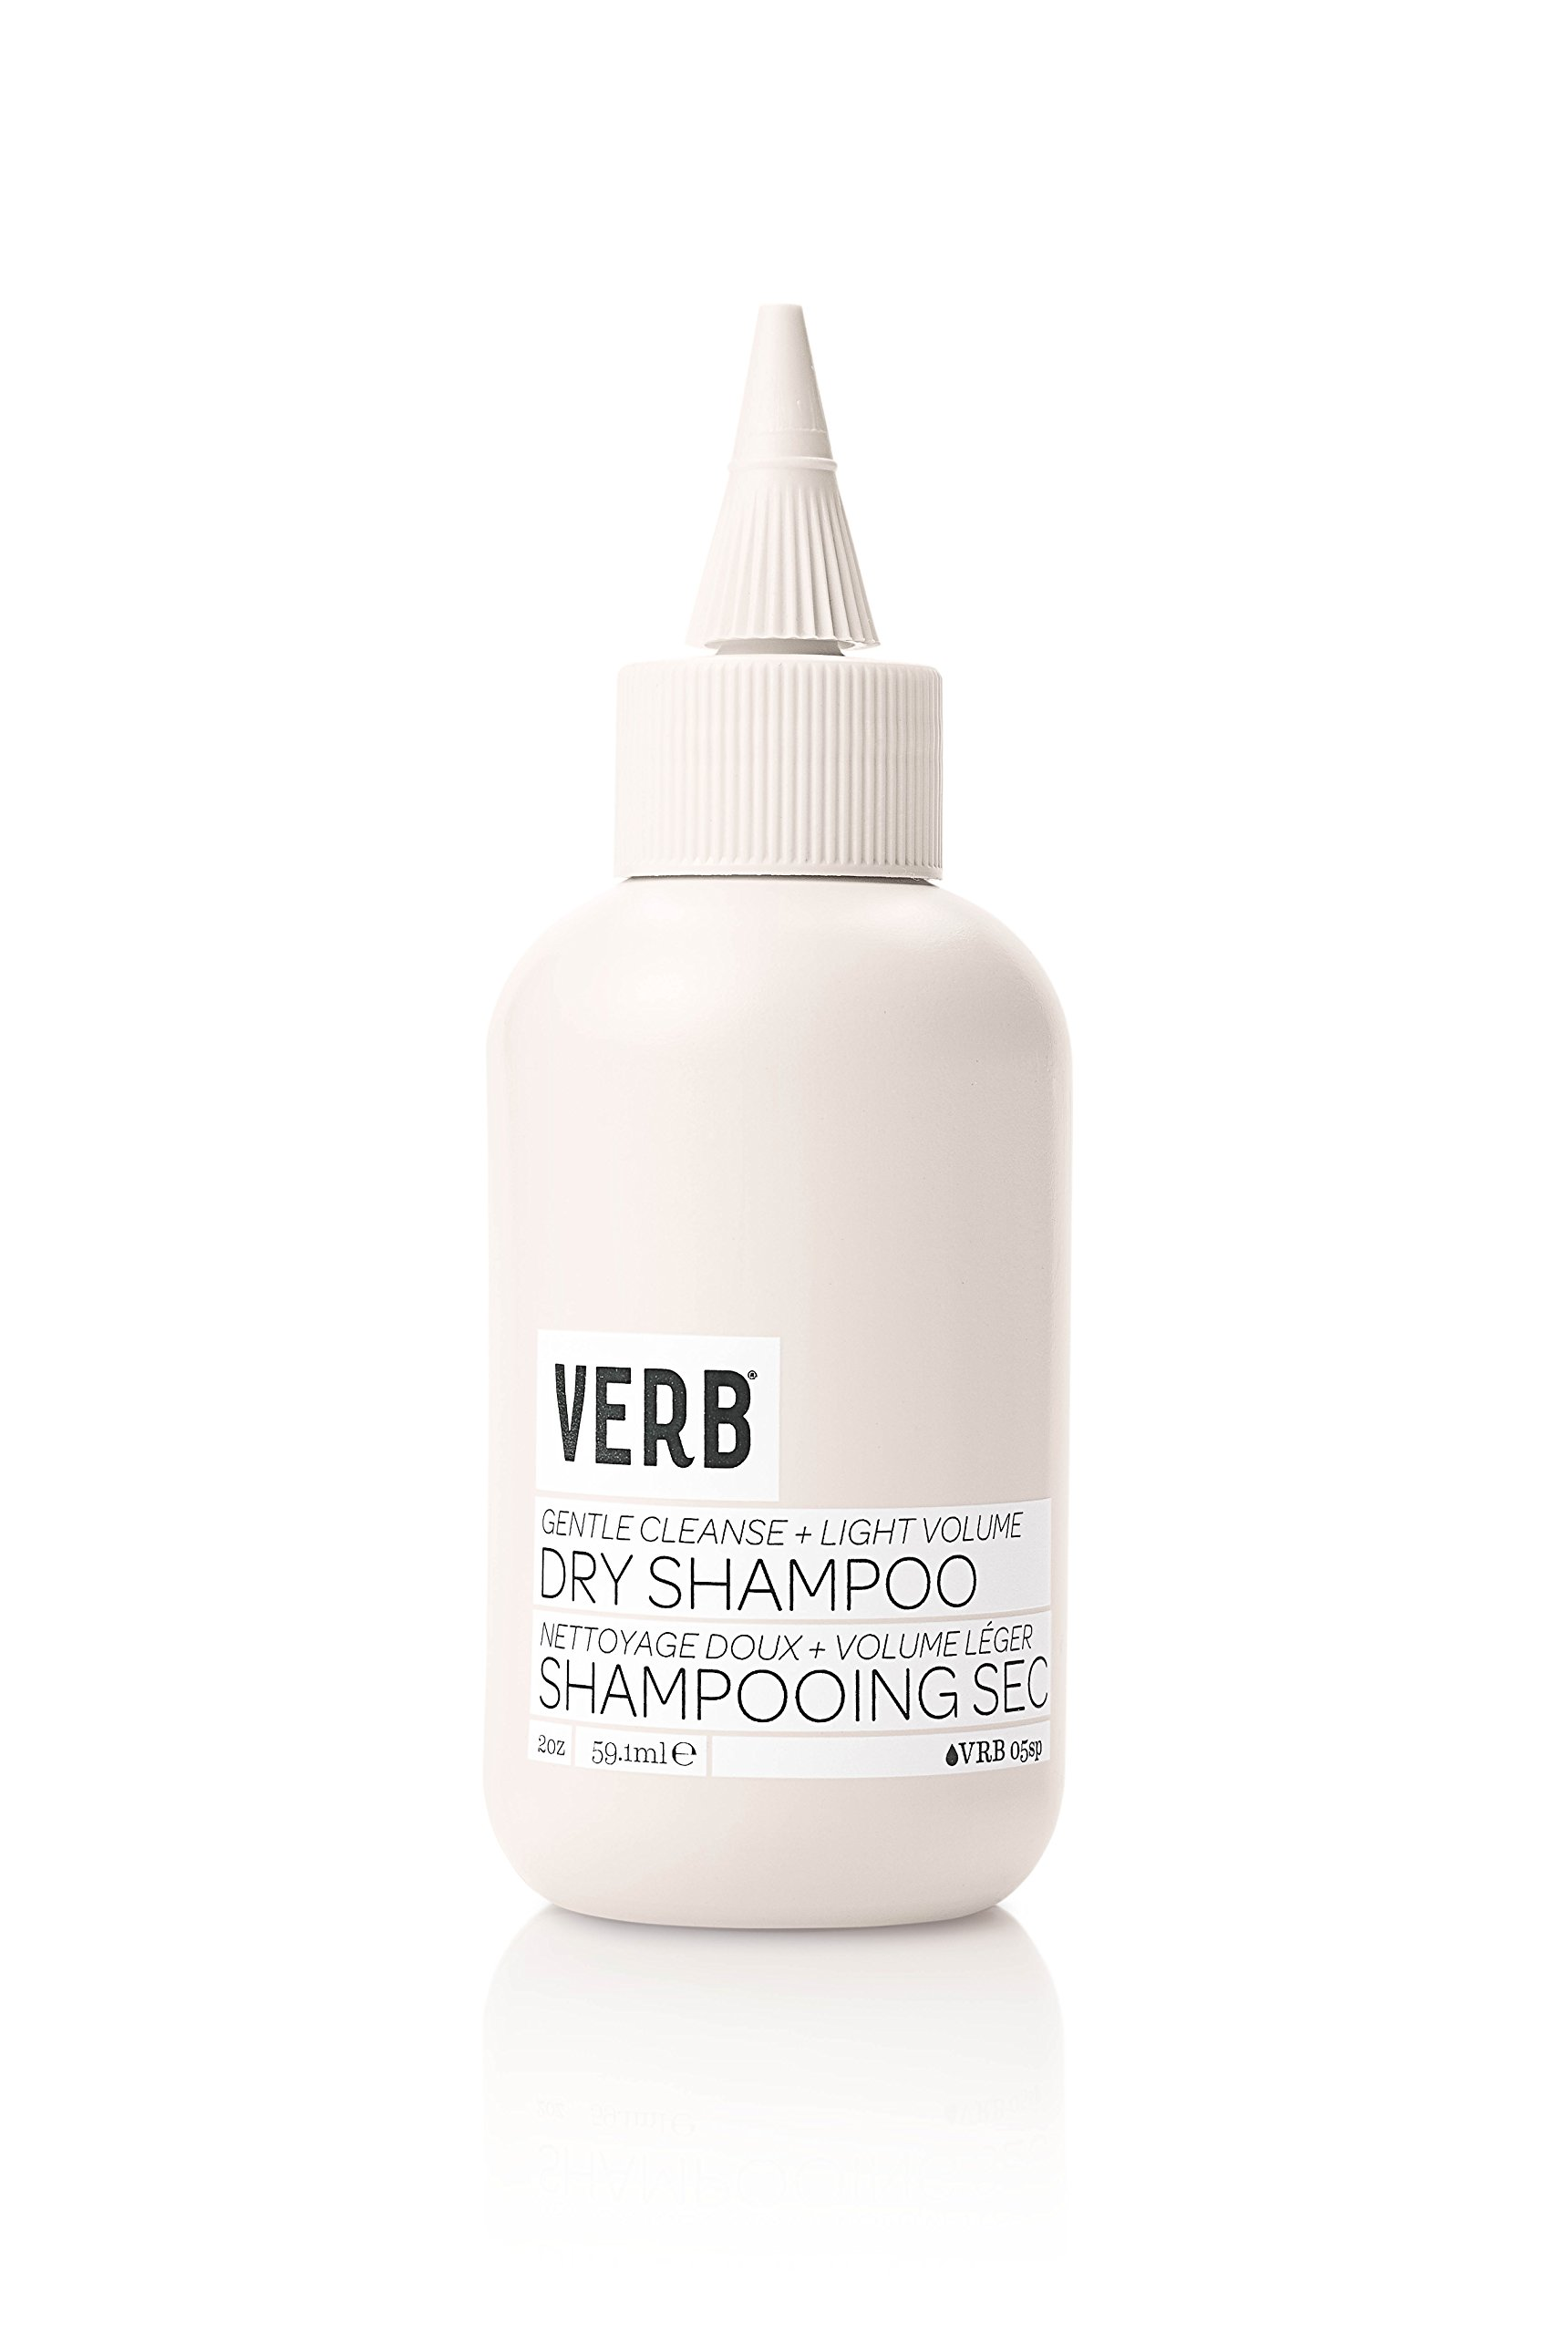 Verb Dry Shampoo - Gentle Cleanse + Light Volume 2oz by verb